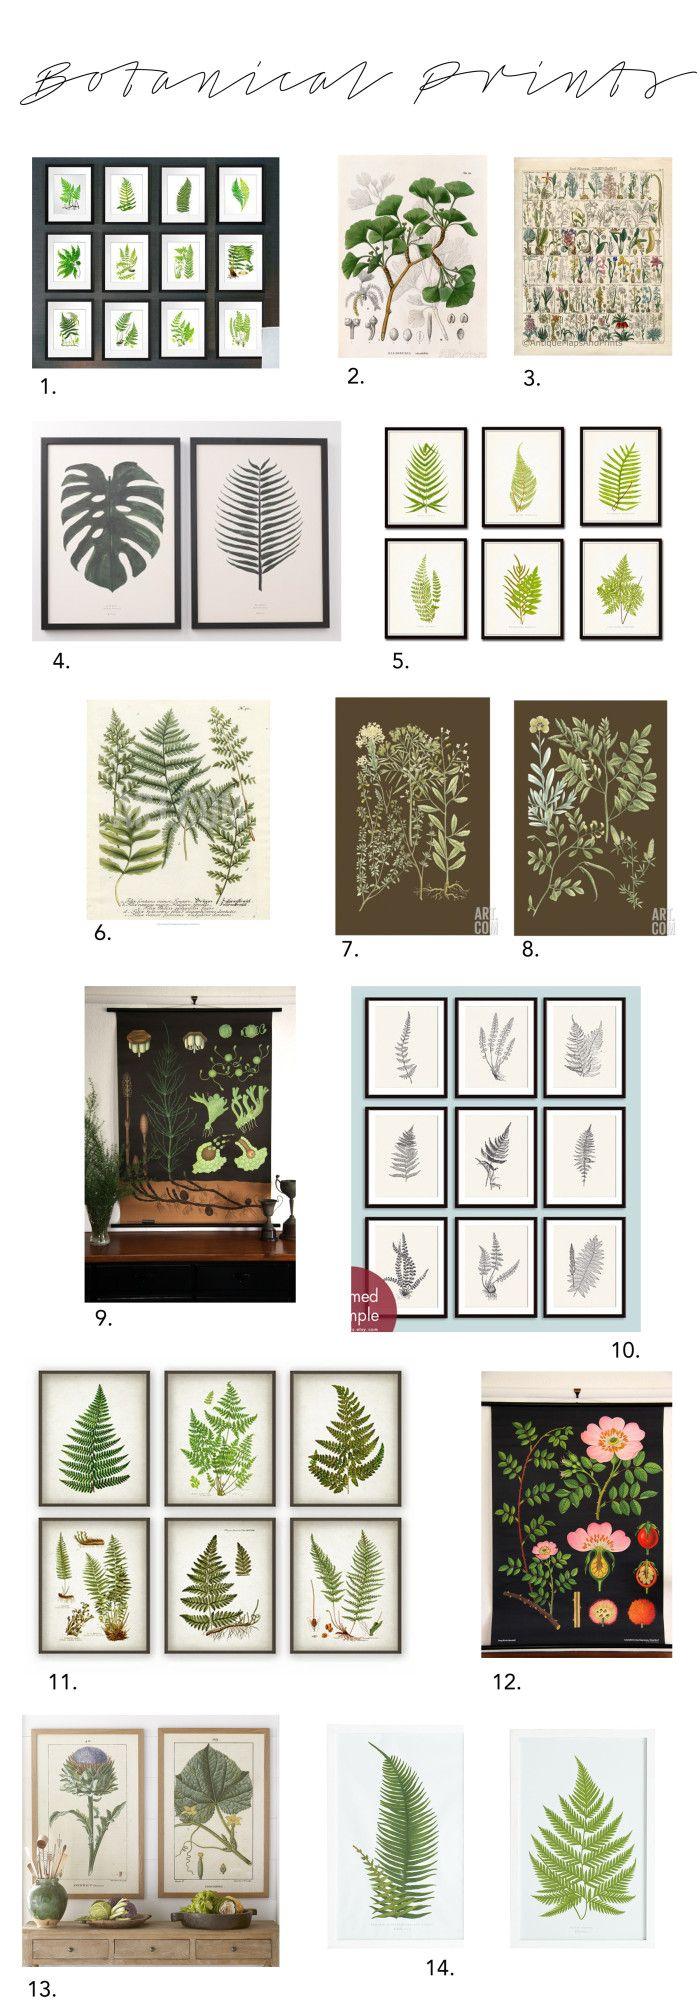 Elements of Style Blog | The Beauty of Botanicals | http://www.elementsofstyleblog.com